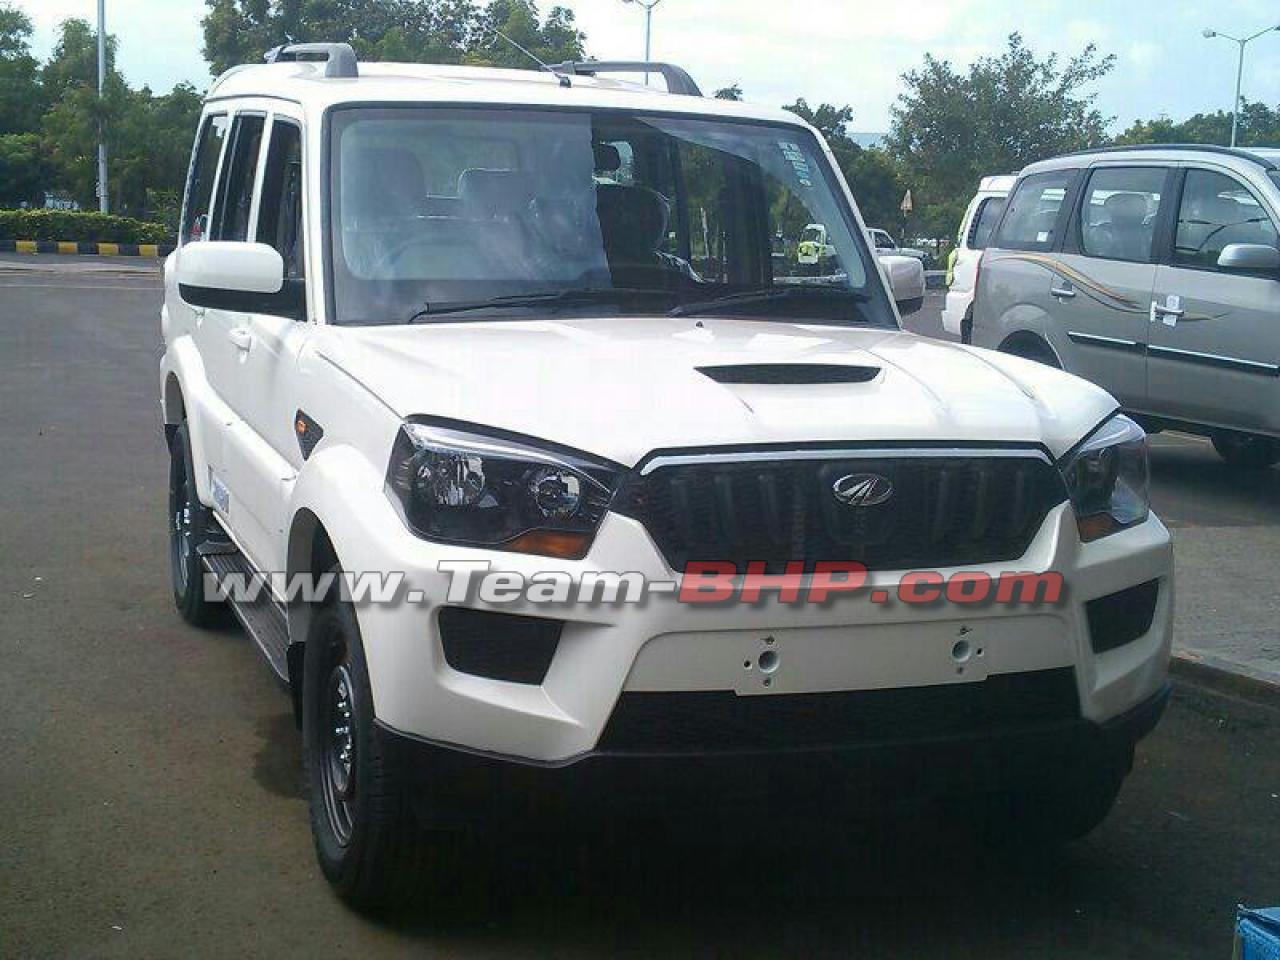 Mahindra scorpio facelift frontview